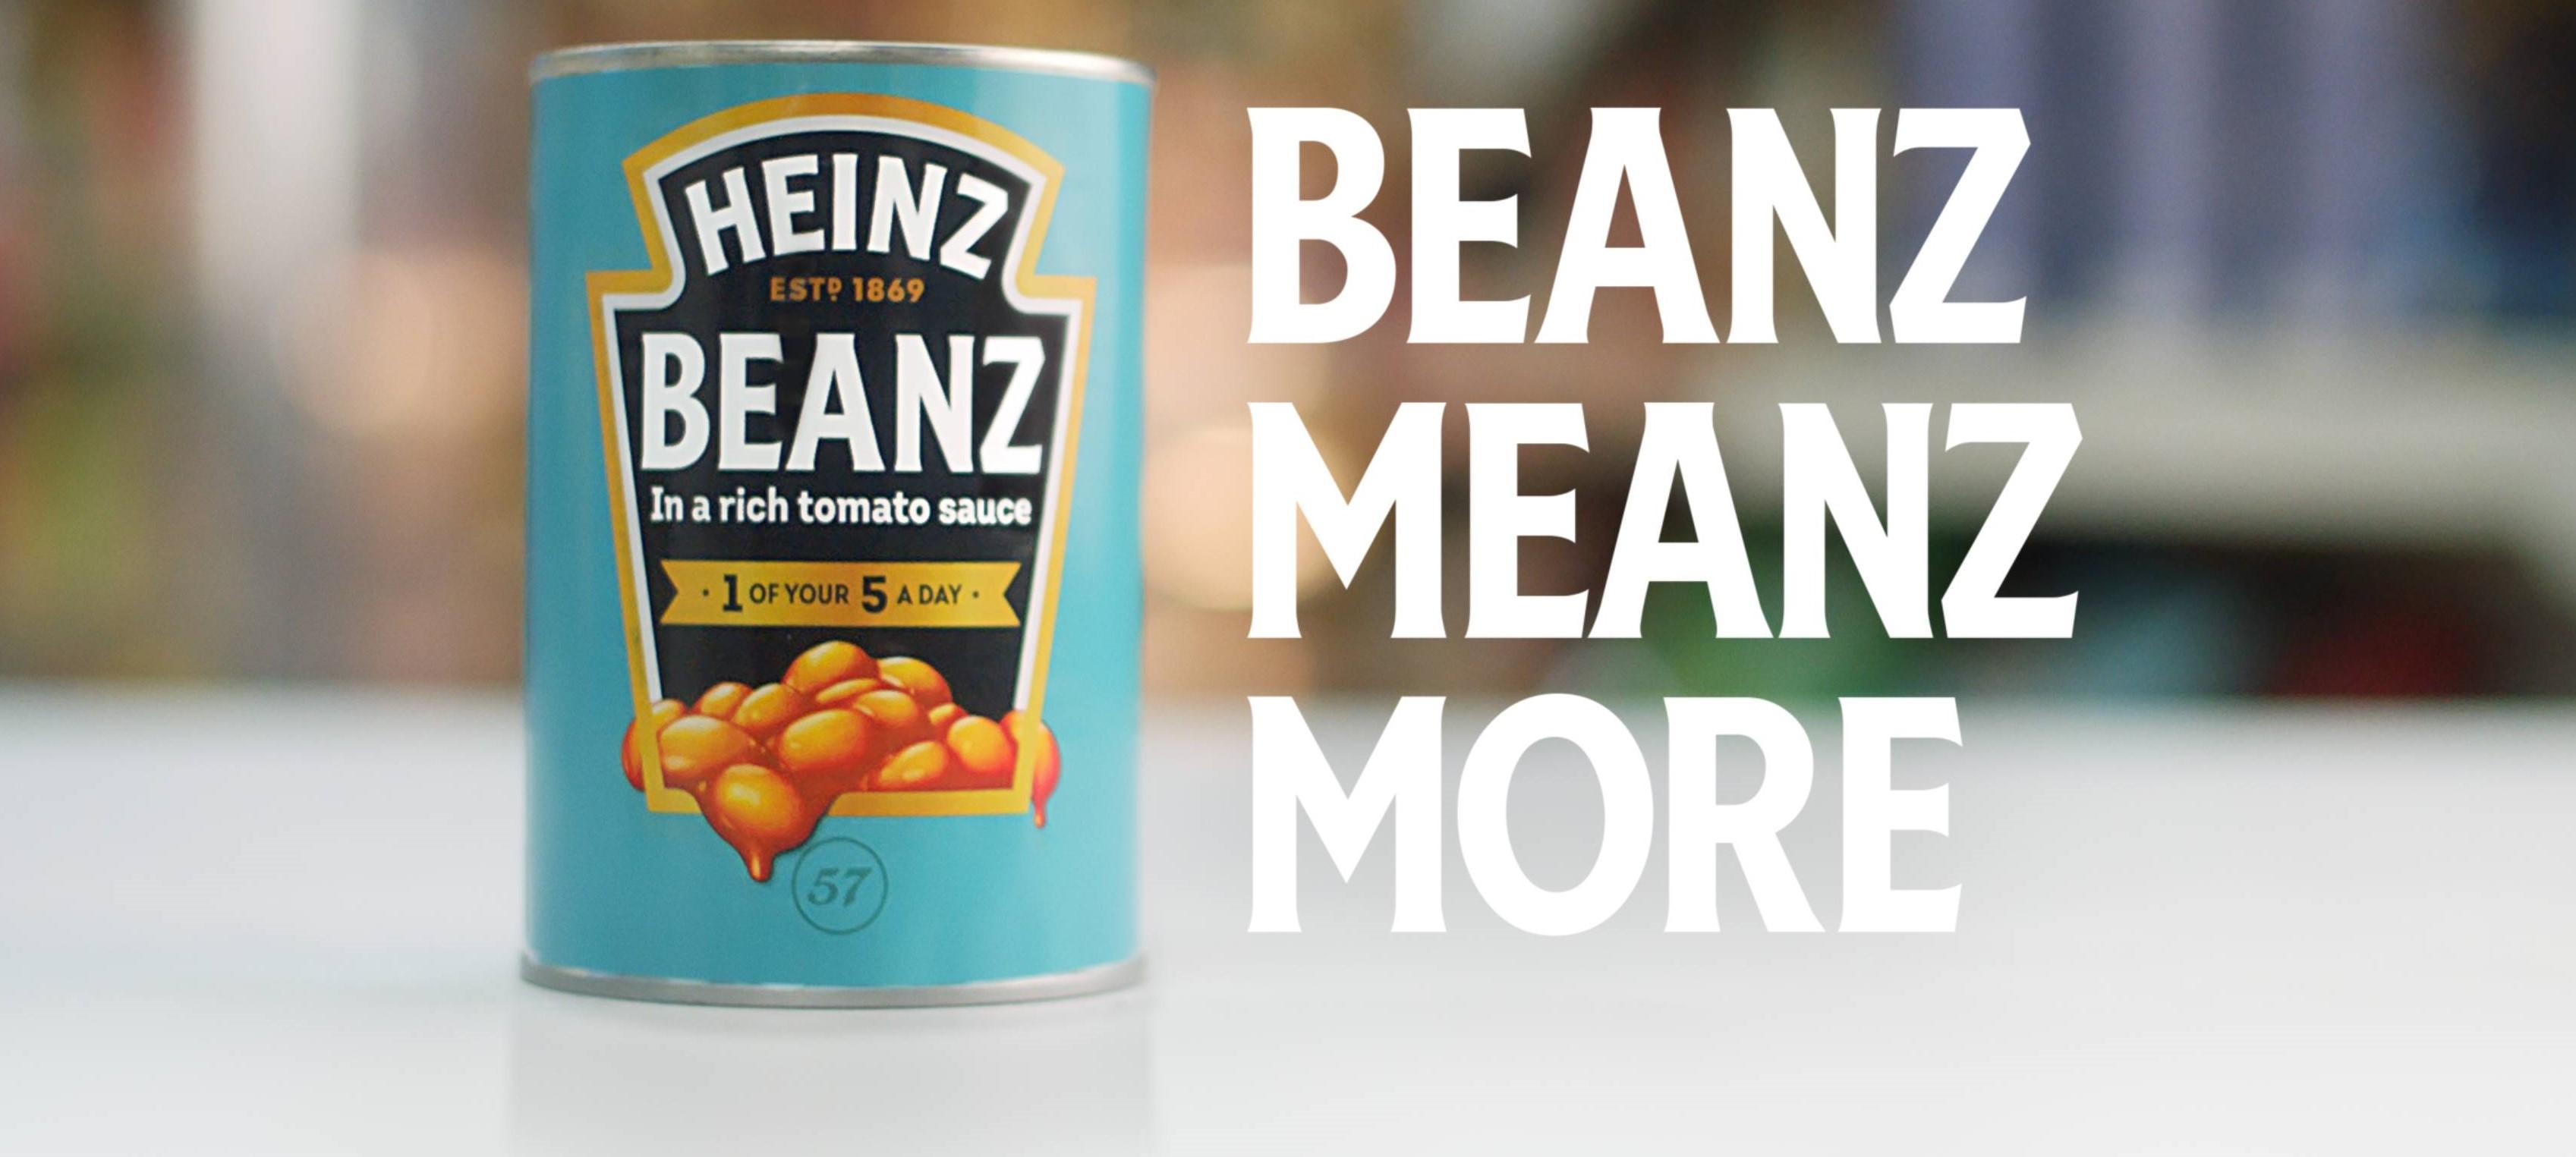 Beanz Meanz More